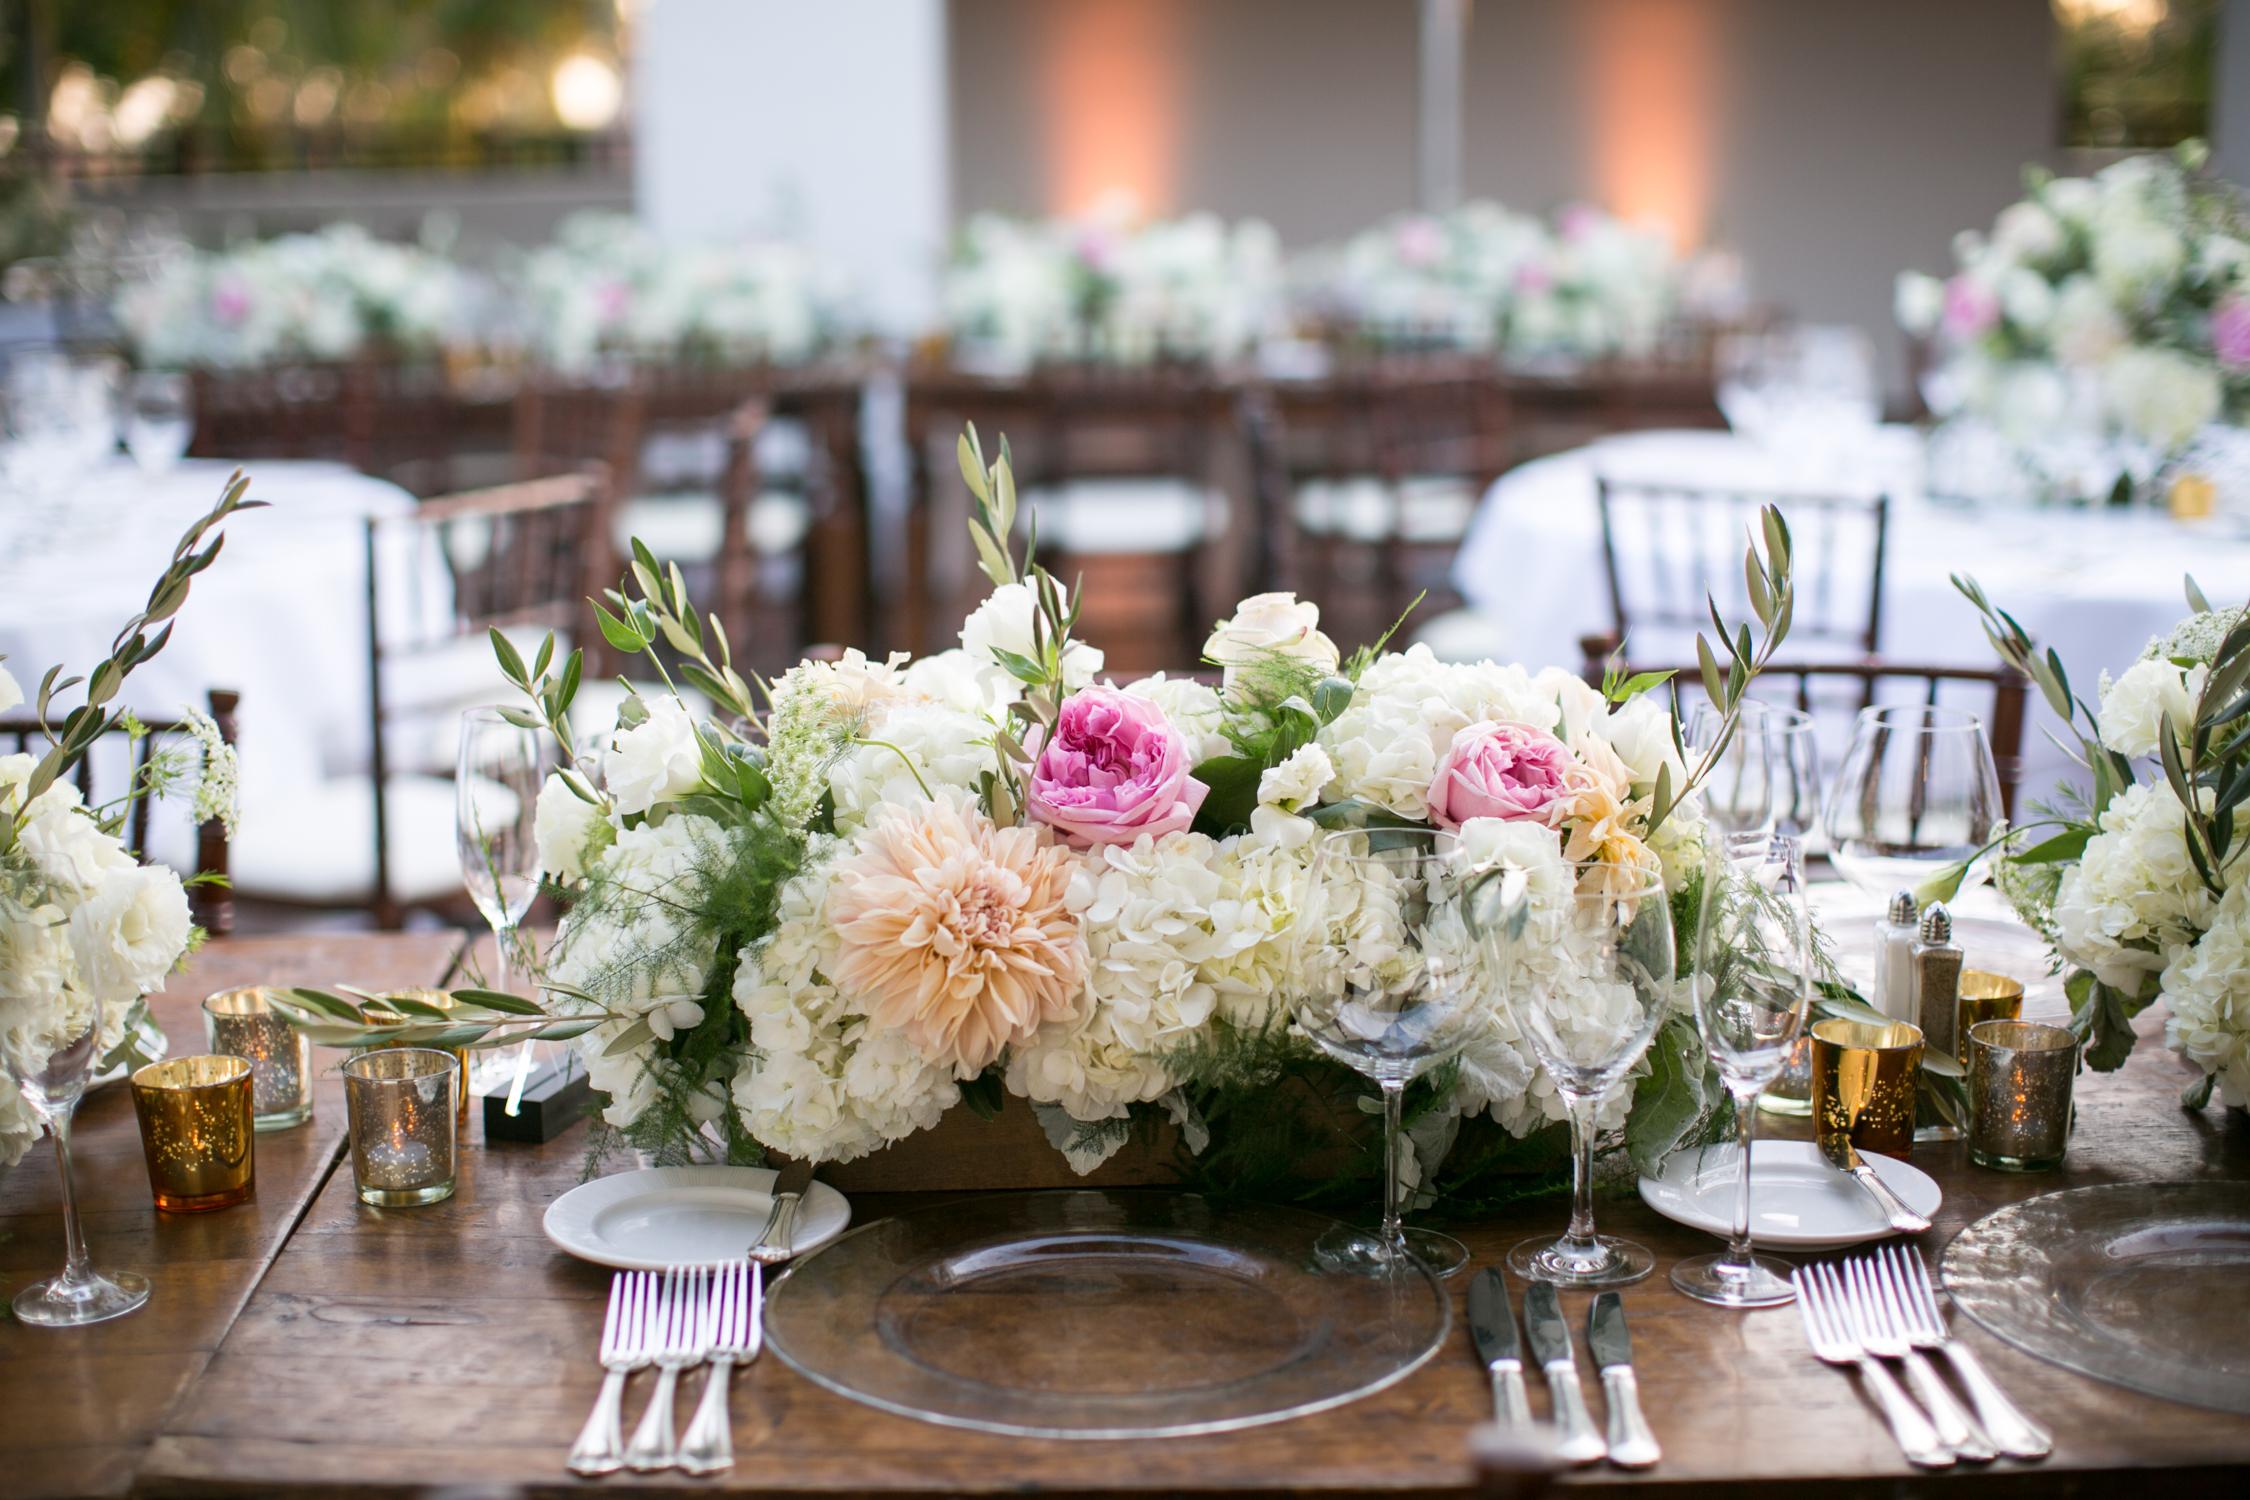 alegria-by-design-wedding-planner-planning-coordinator-day-off-event-design-bacara-resort-ritz-carlton-santa-barbara-garden-ocean-view-location-venue-patio (13).jpg